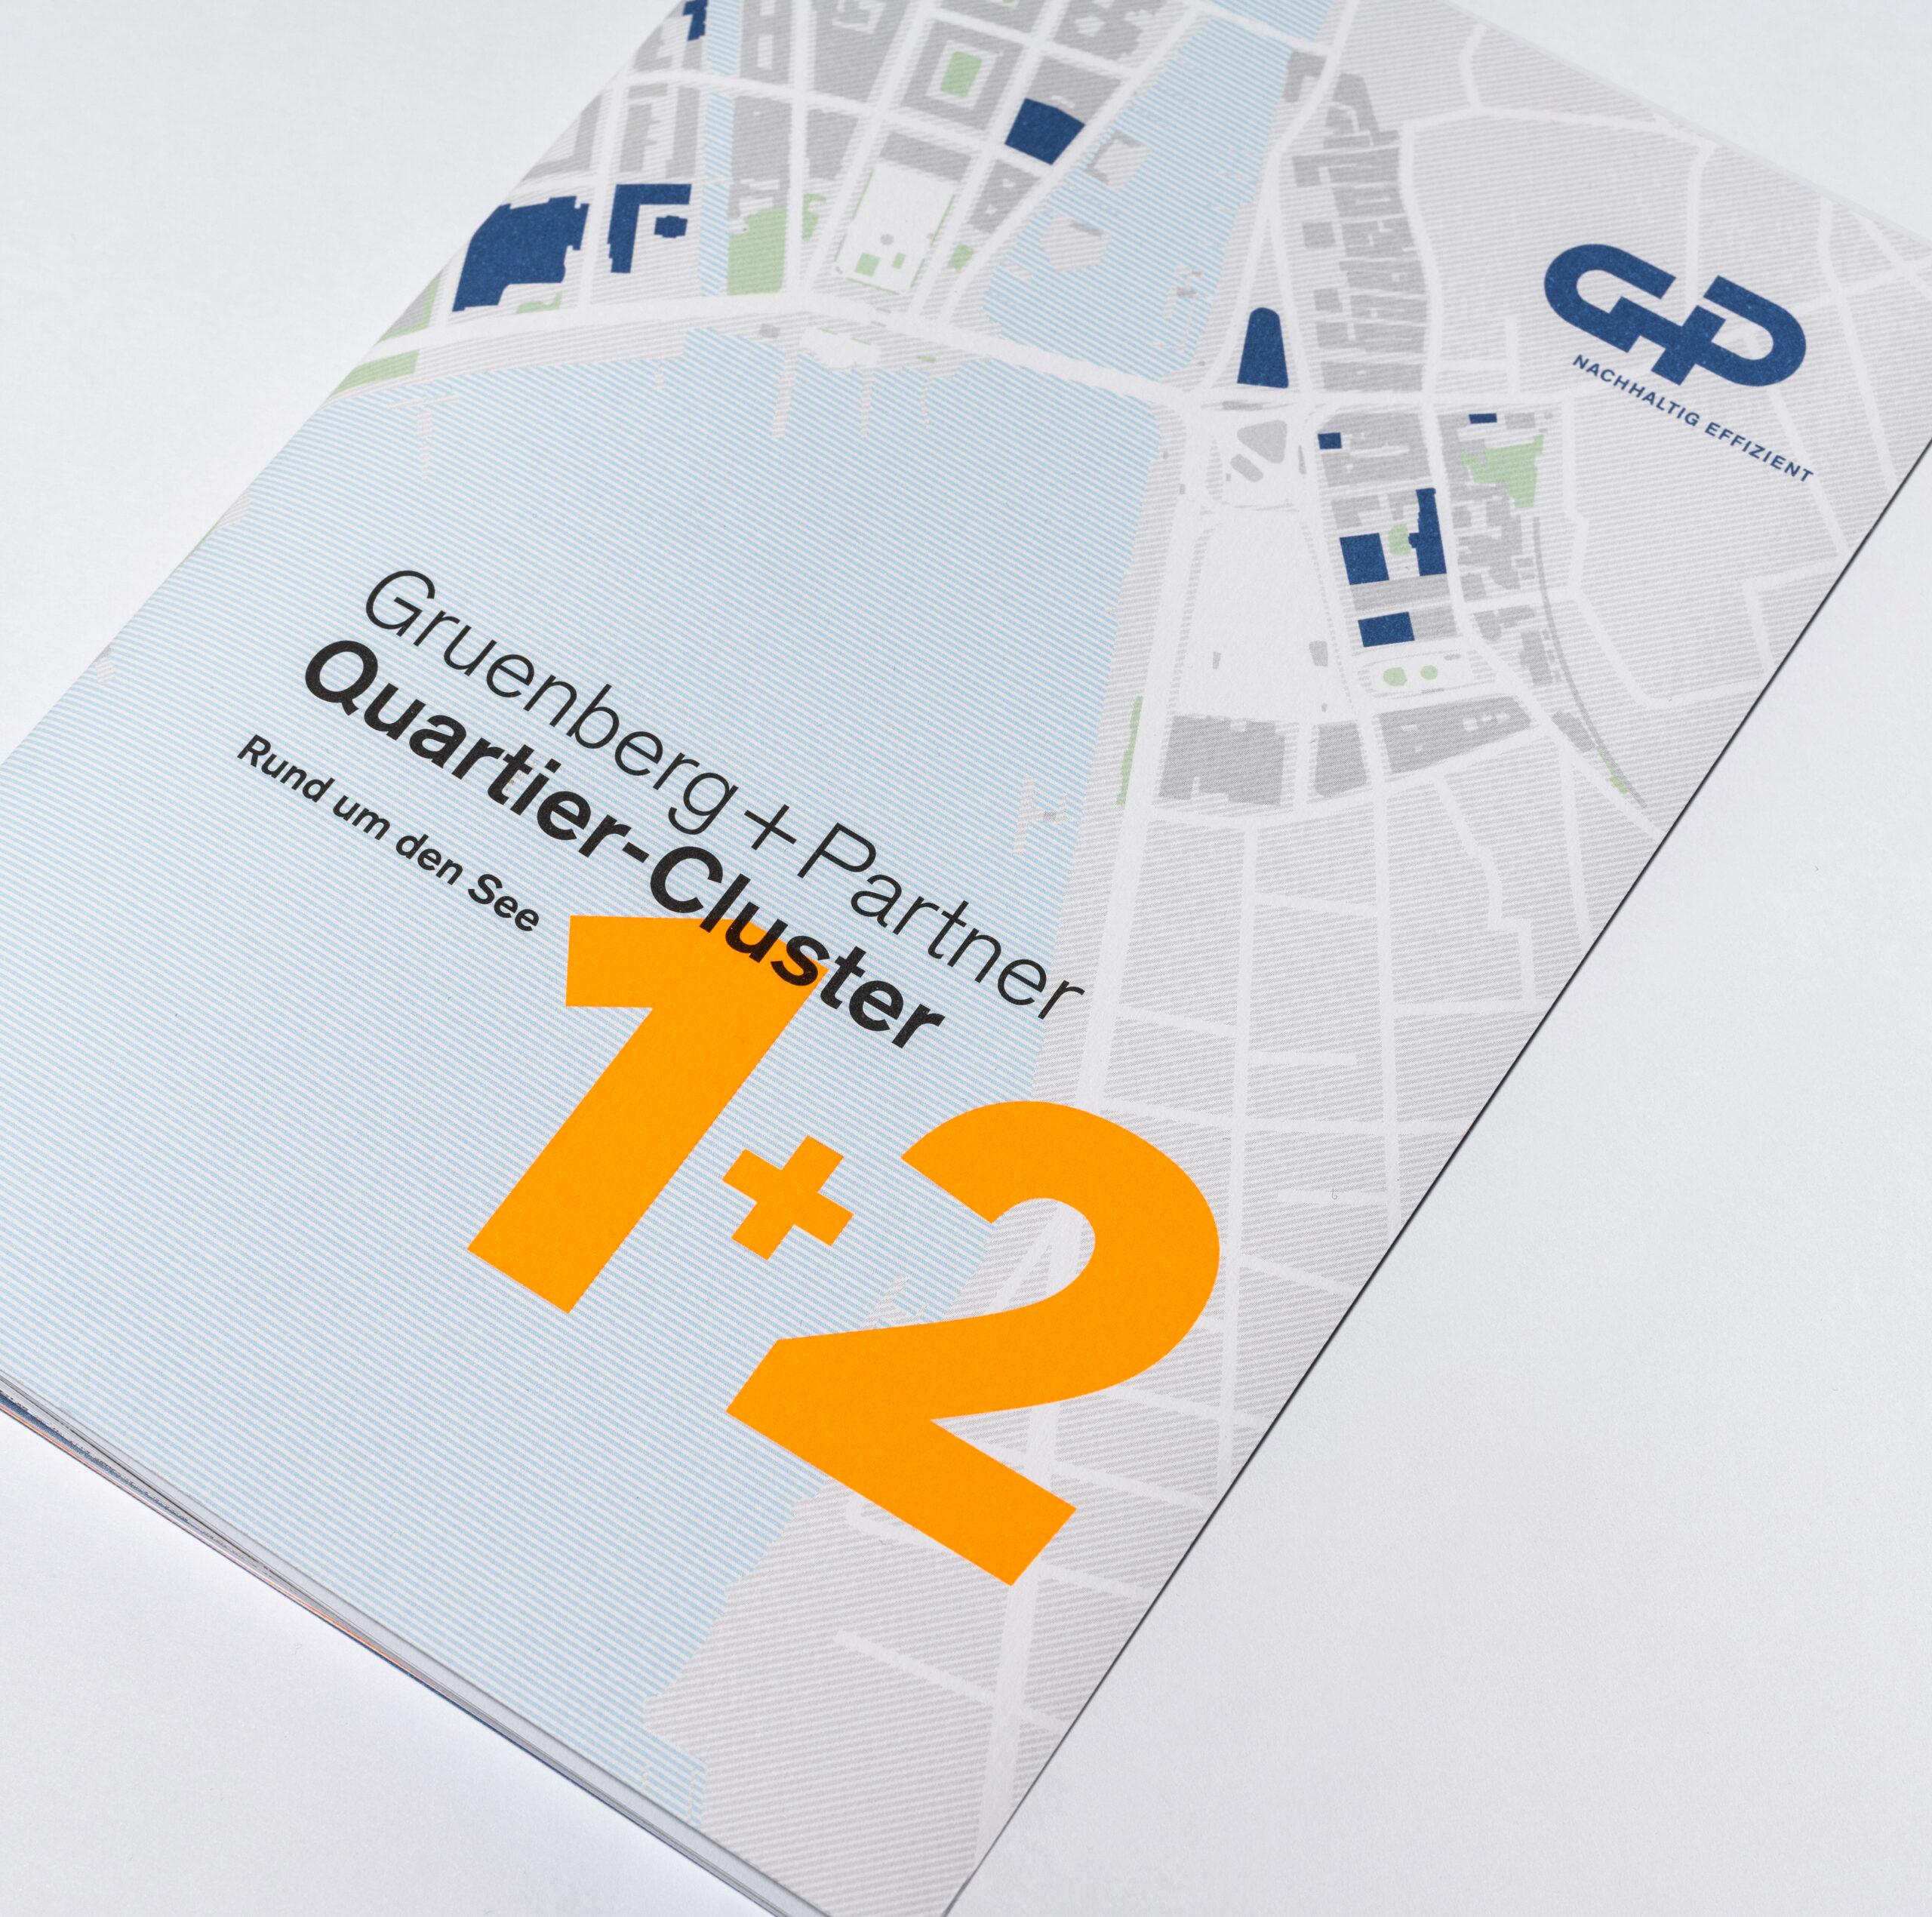 gruenberg-quartiercluster044